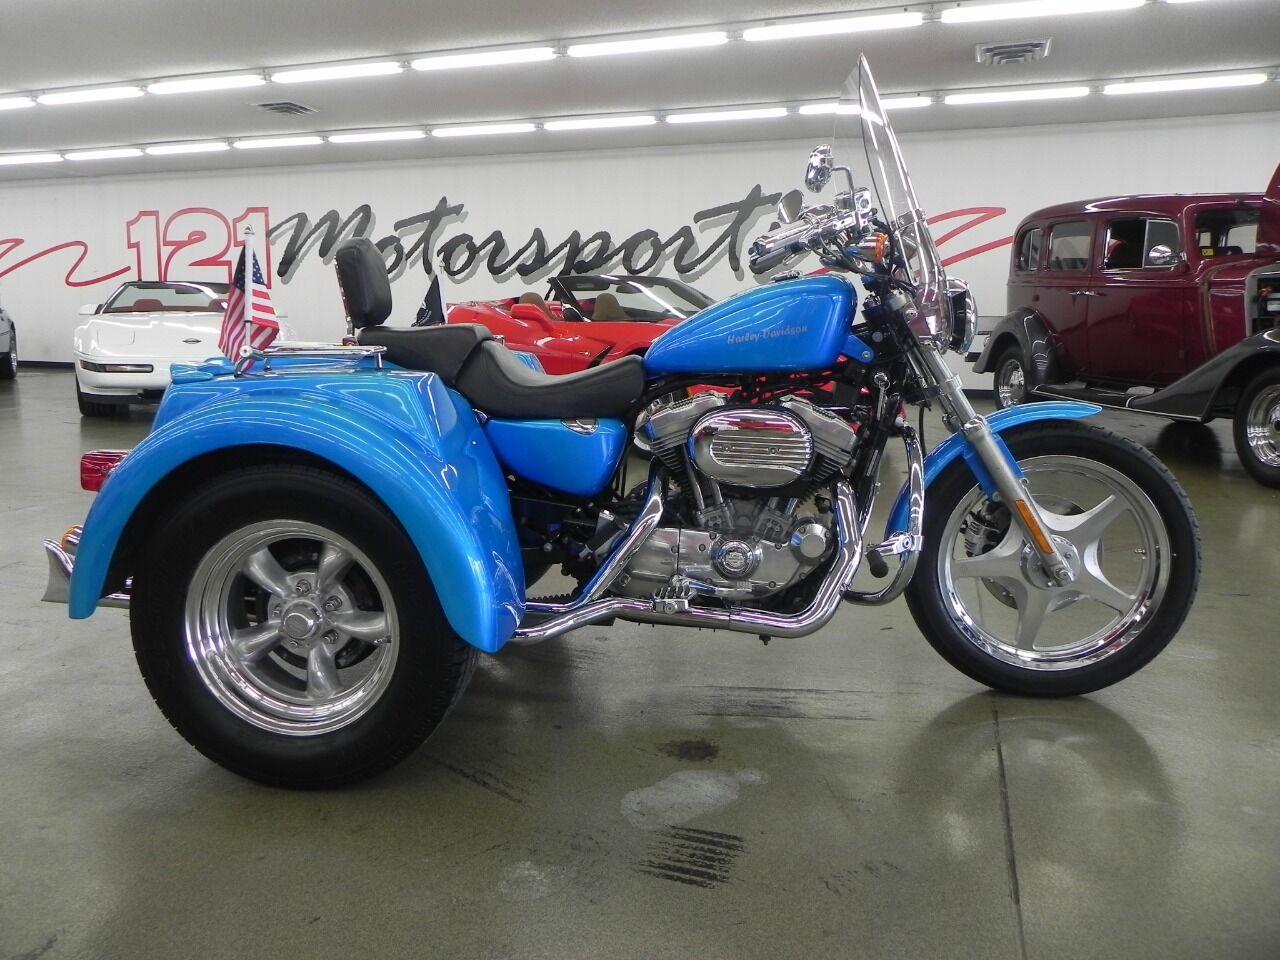 2005 Harley-Davidson Sportster 883 Trike Conversion